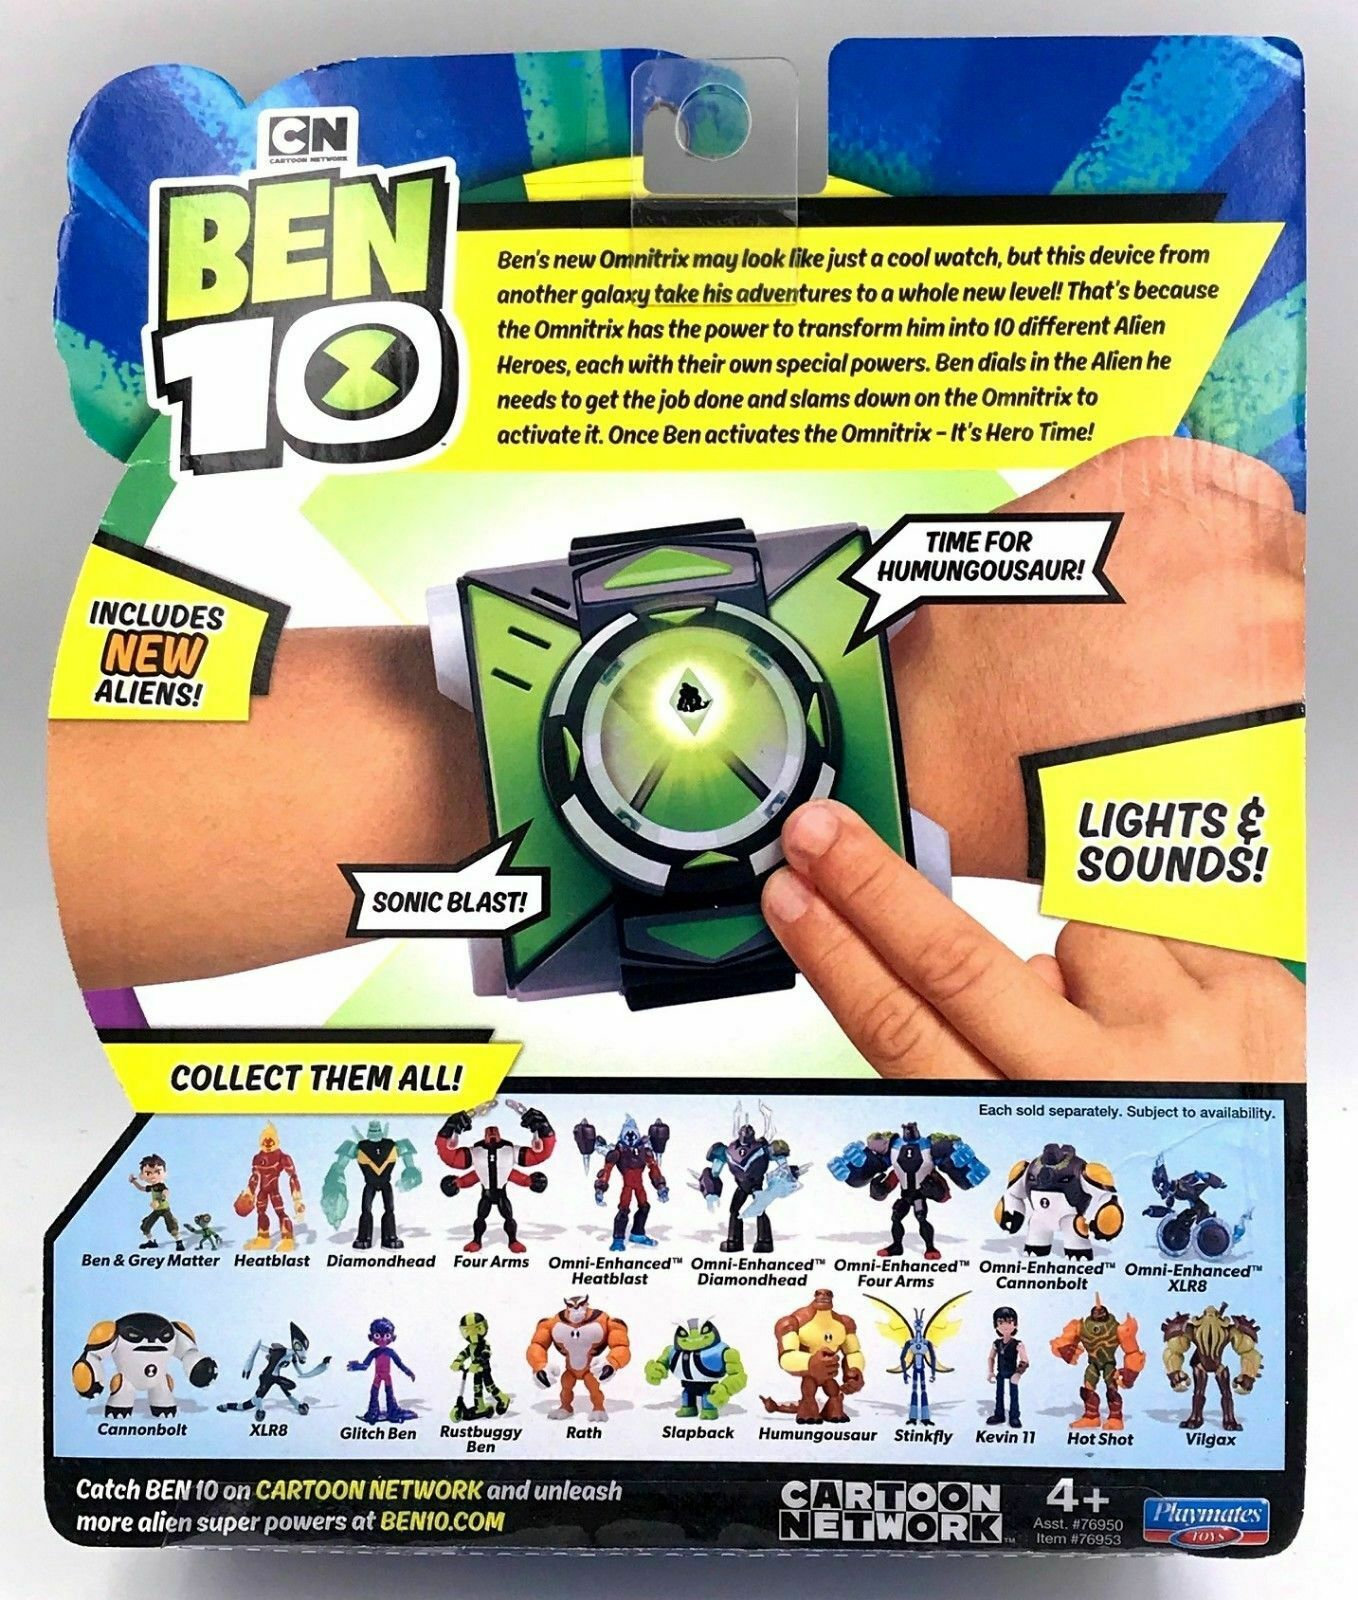 NEW Ben 10 OMNITRIX Watch Season 3 40 Plus Phrases Cartoon Network CN 2019